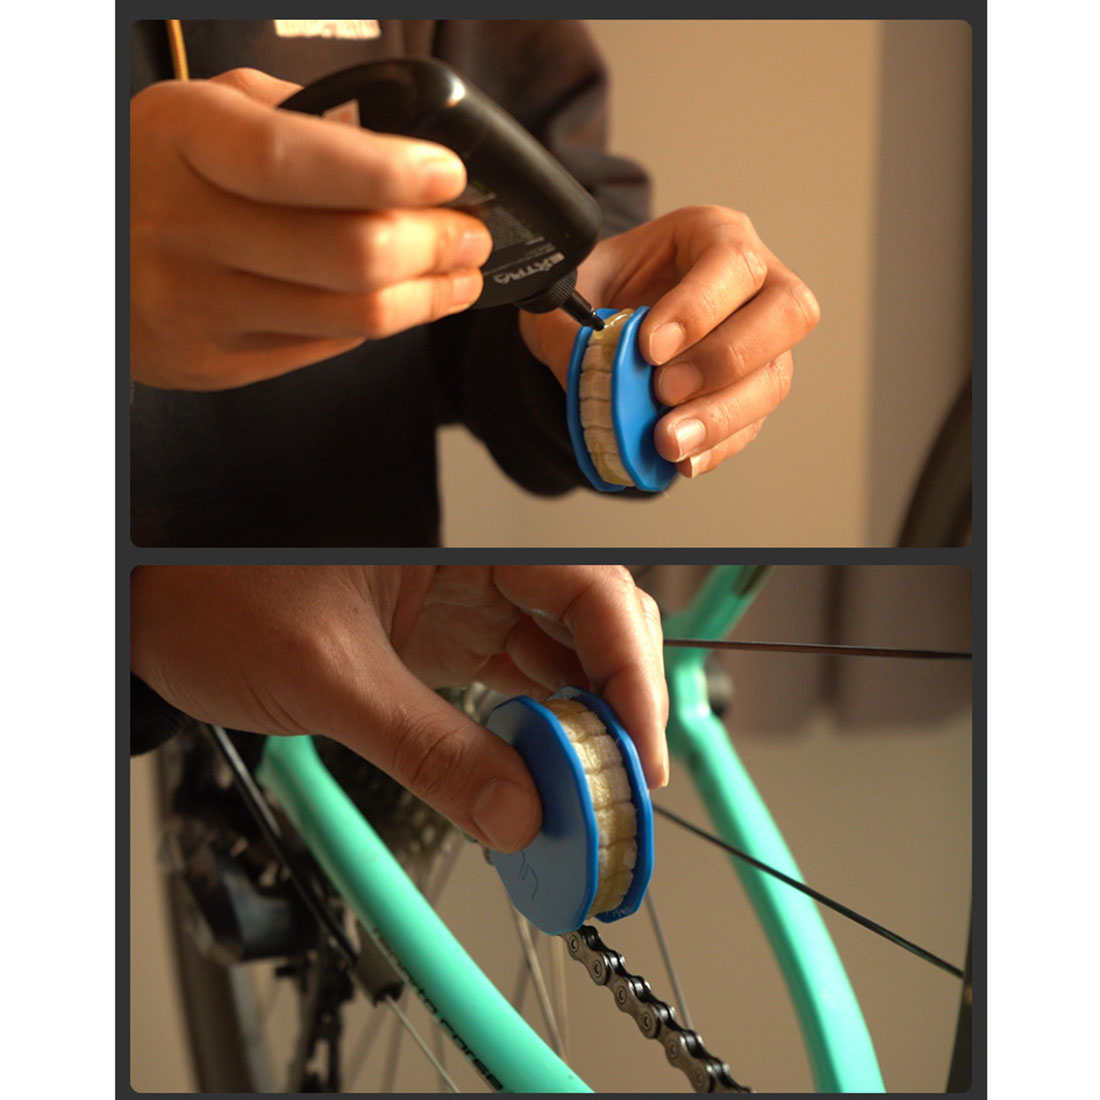 ABS Bicycle Chain Roller Oiler Wool Lubricant Lube Oil Lubricator Bike Tool 59mm